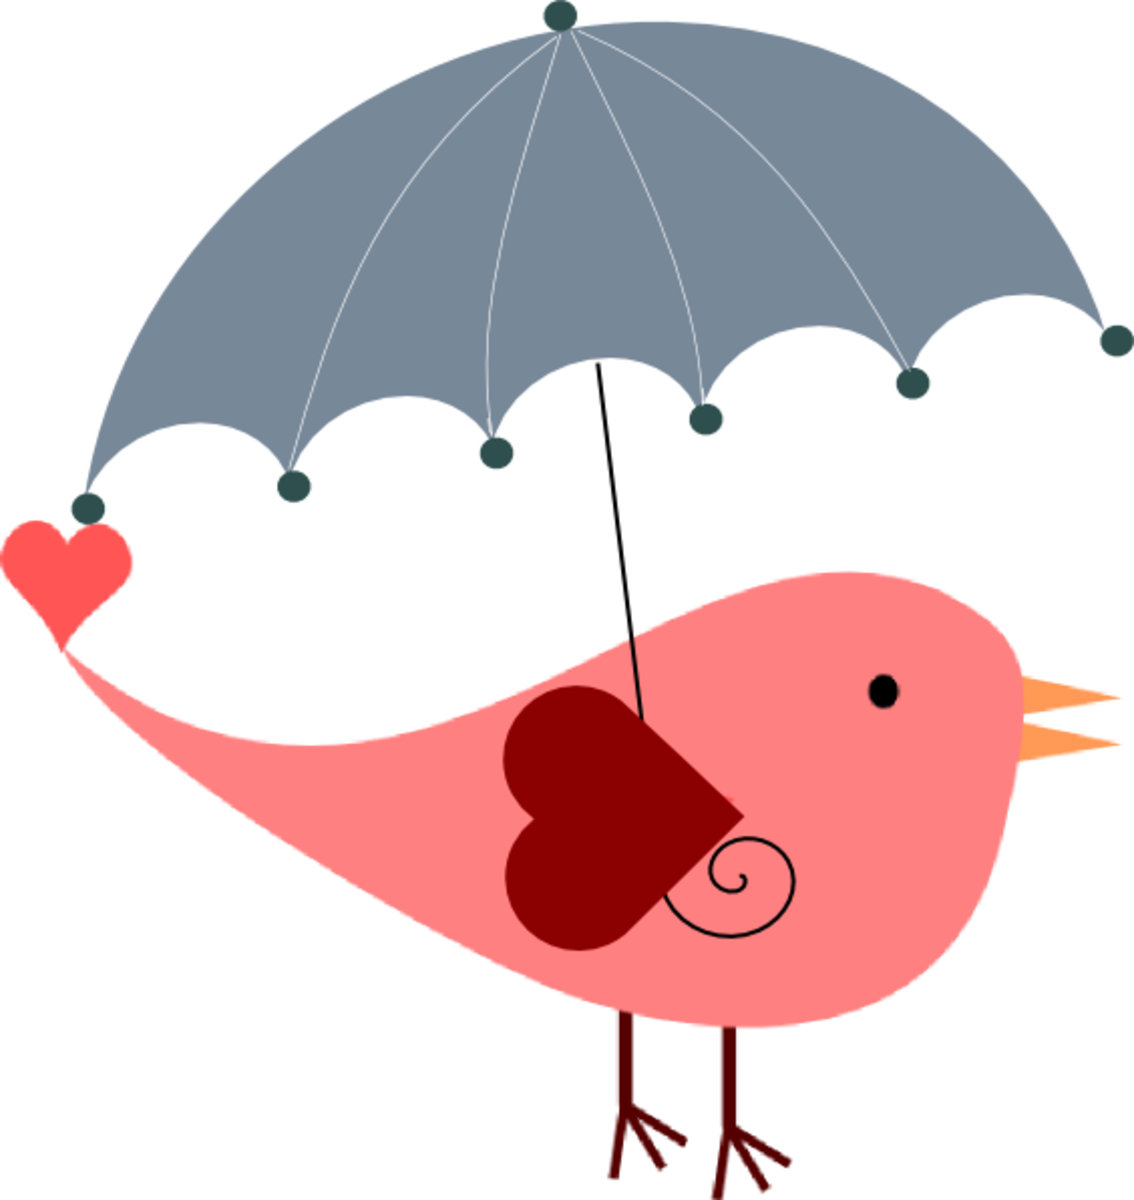 Bird with Umbrella